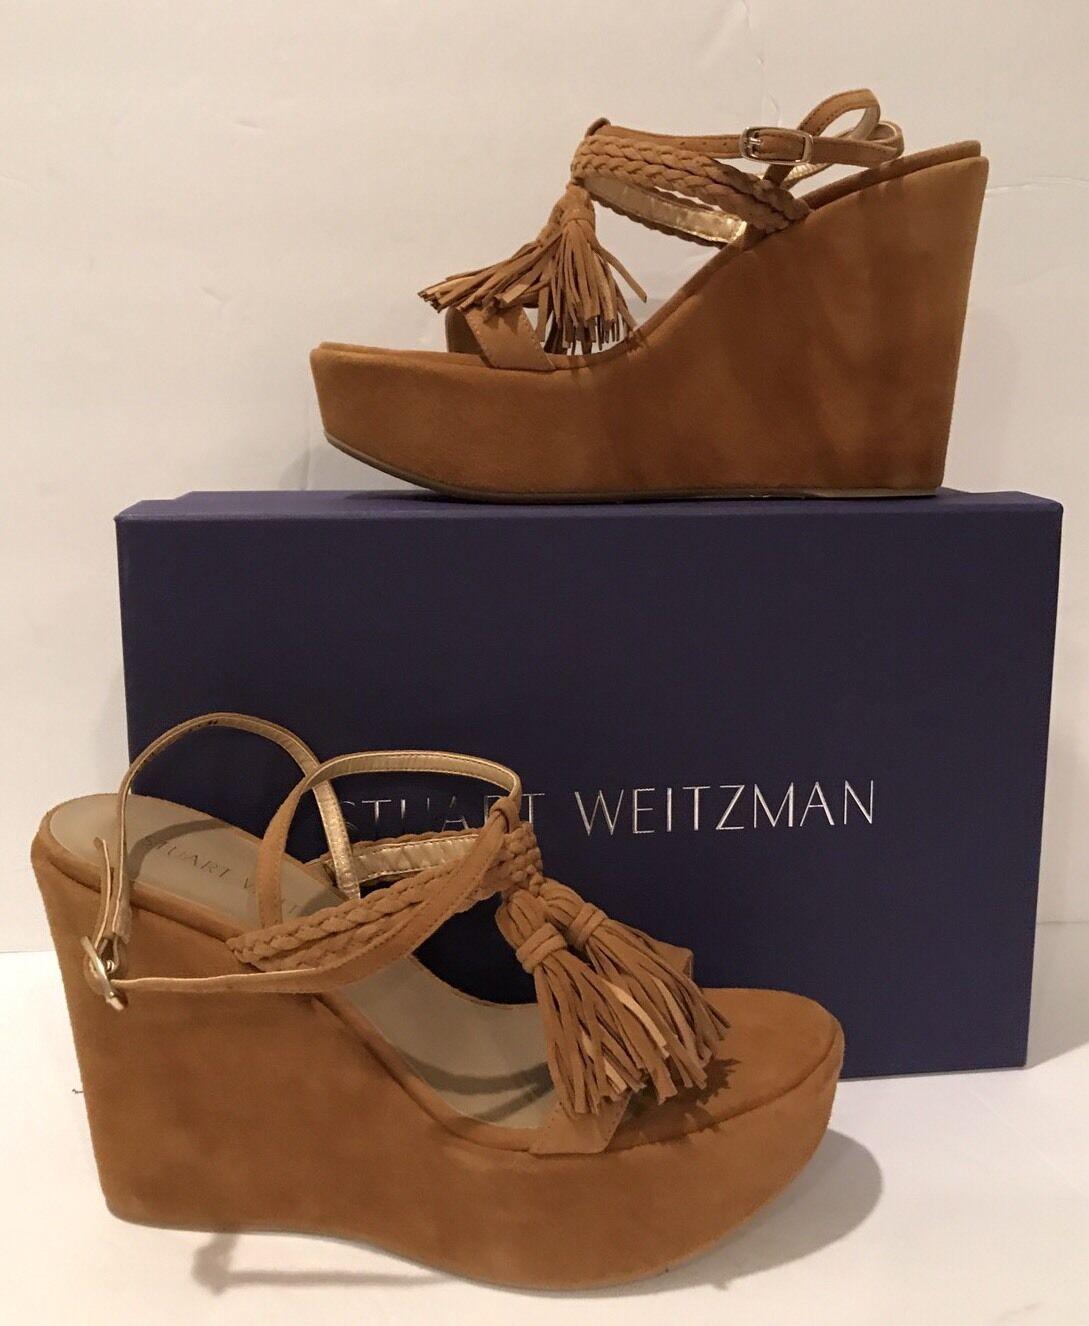 Stuart Weitzman tasselmania camel camel camel compensé espadrille plateforme Fringe Sandal sz 6.5 753dd7